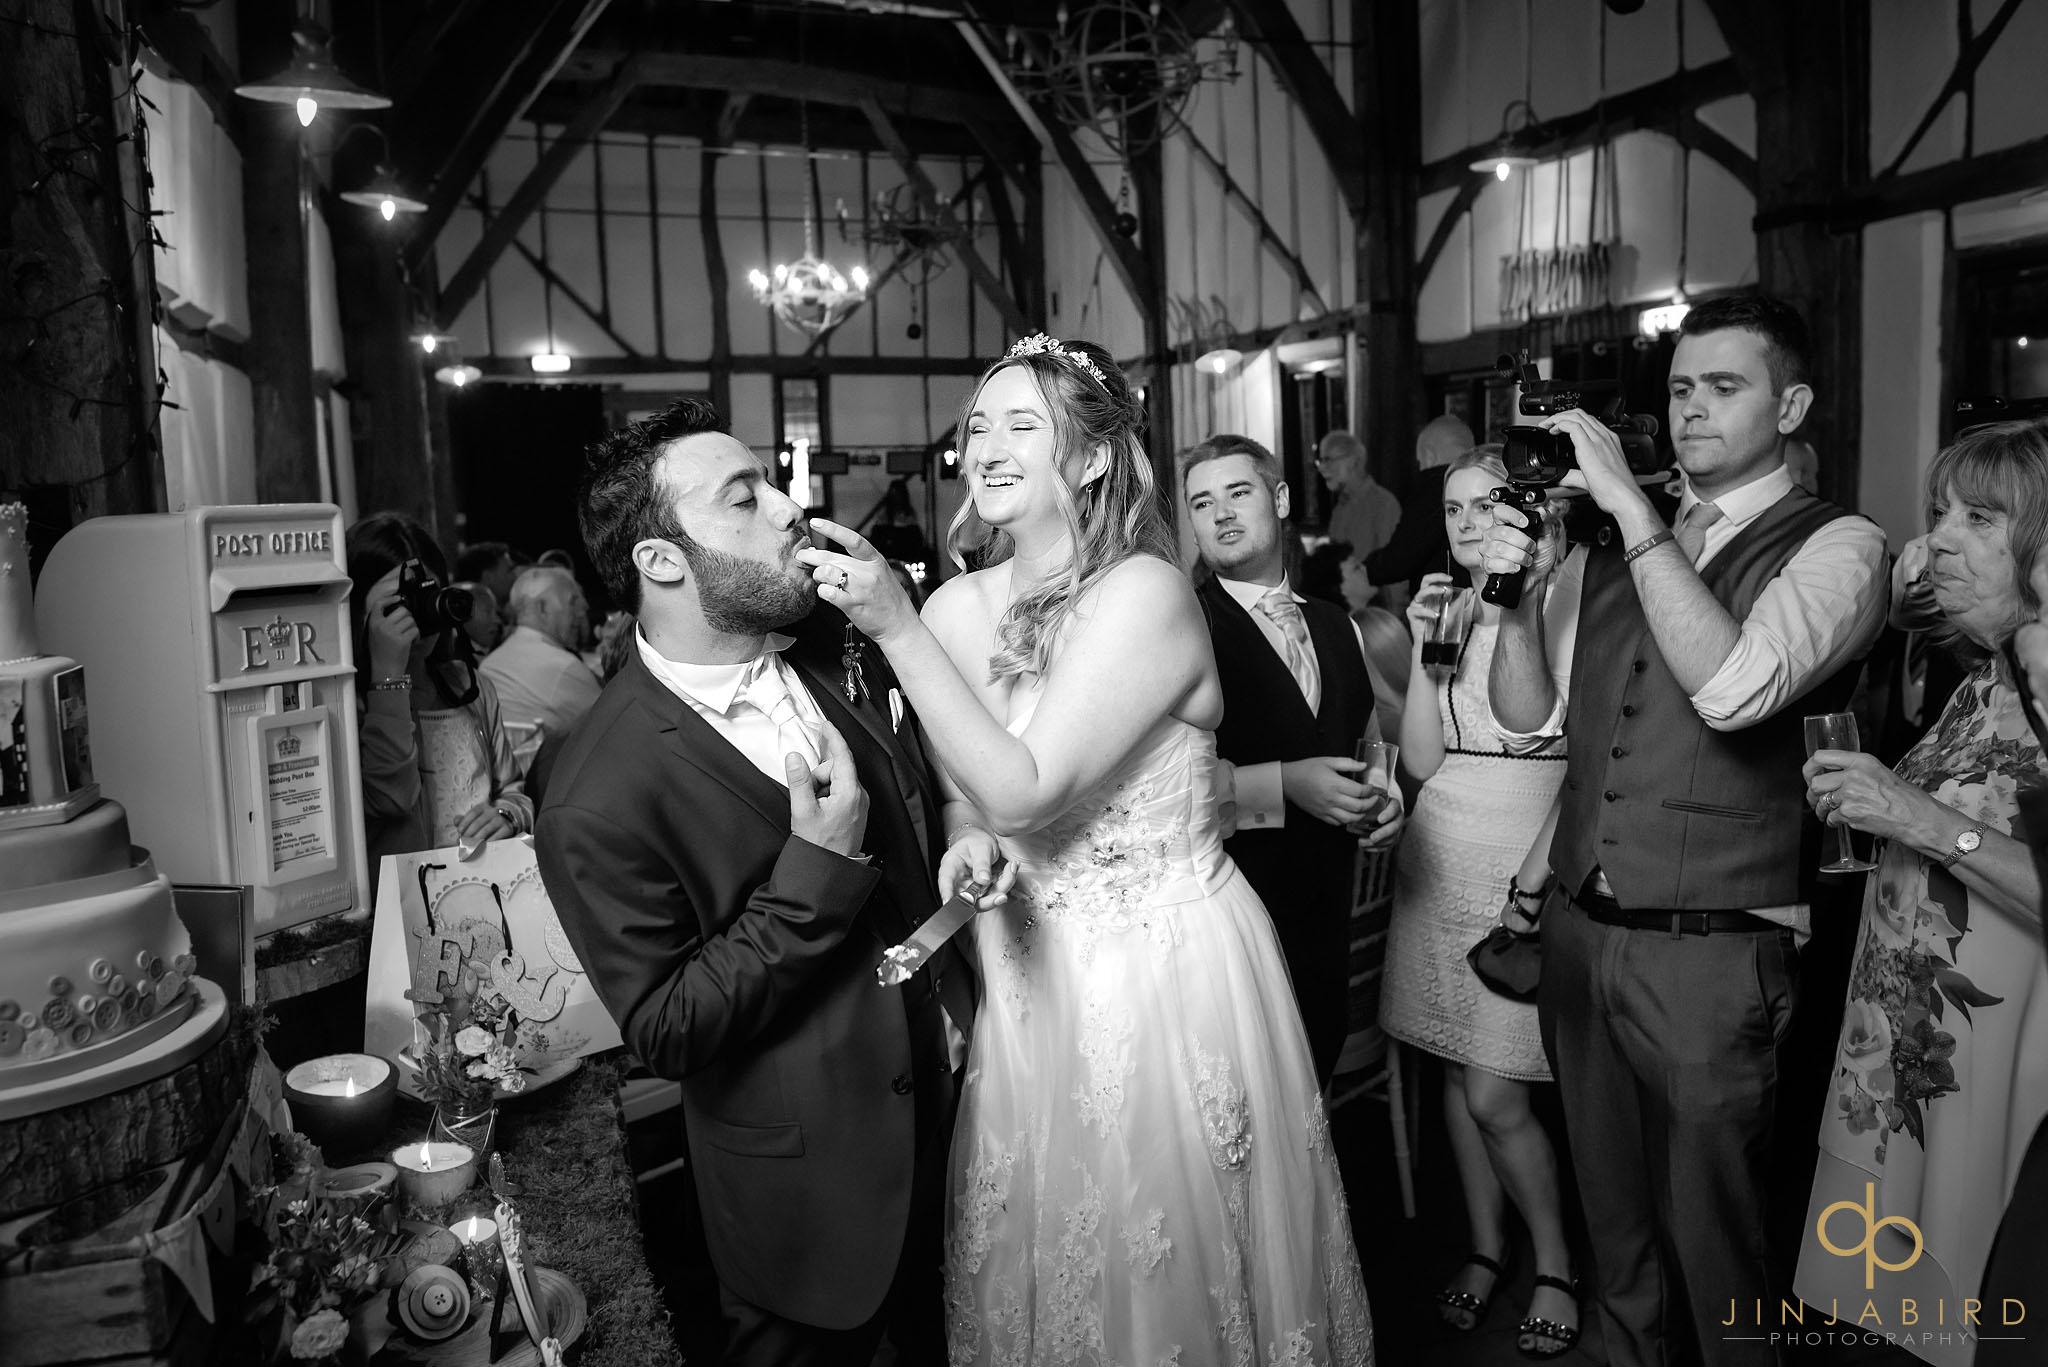 eating-wedding-cake-barns-hotel